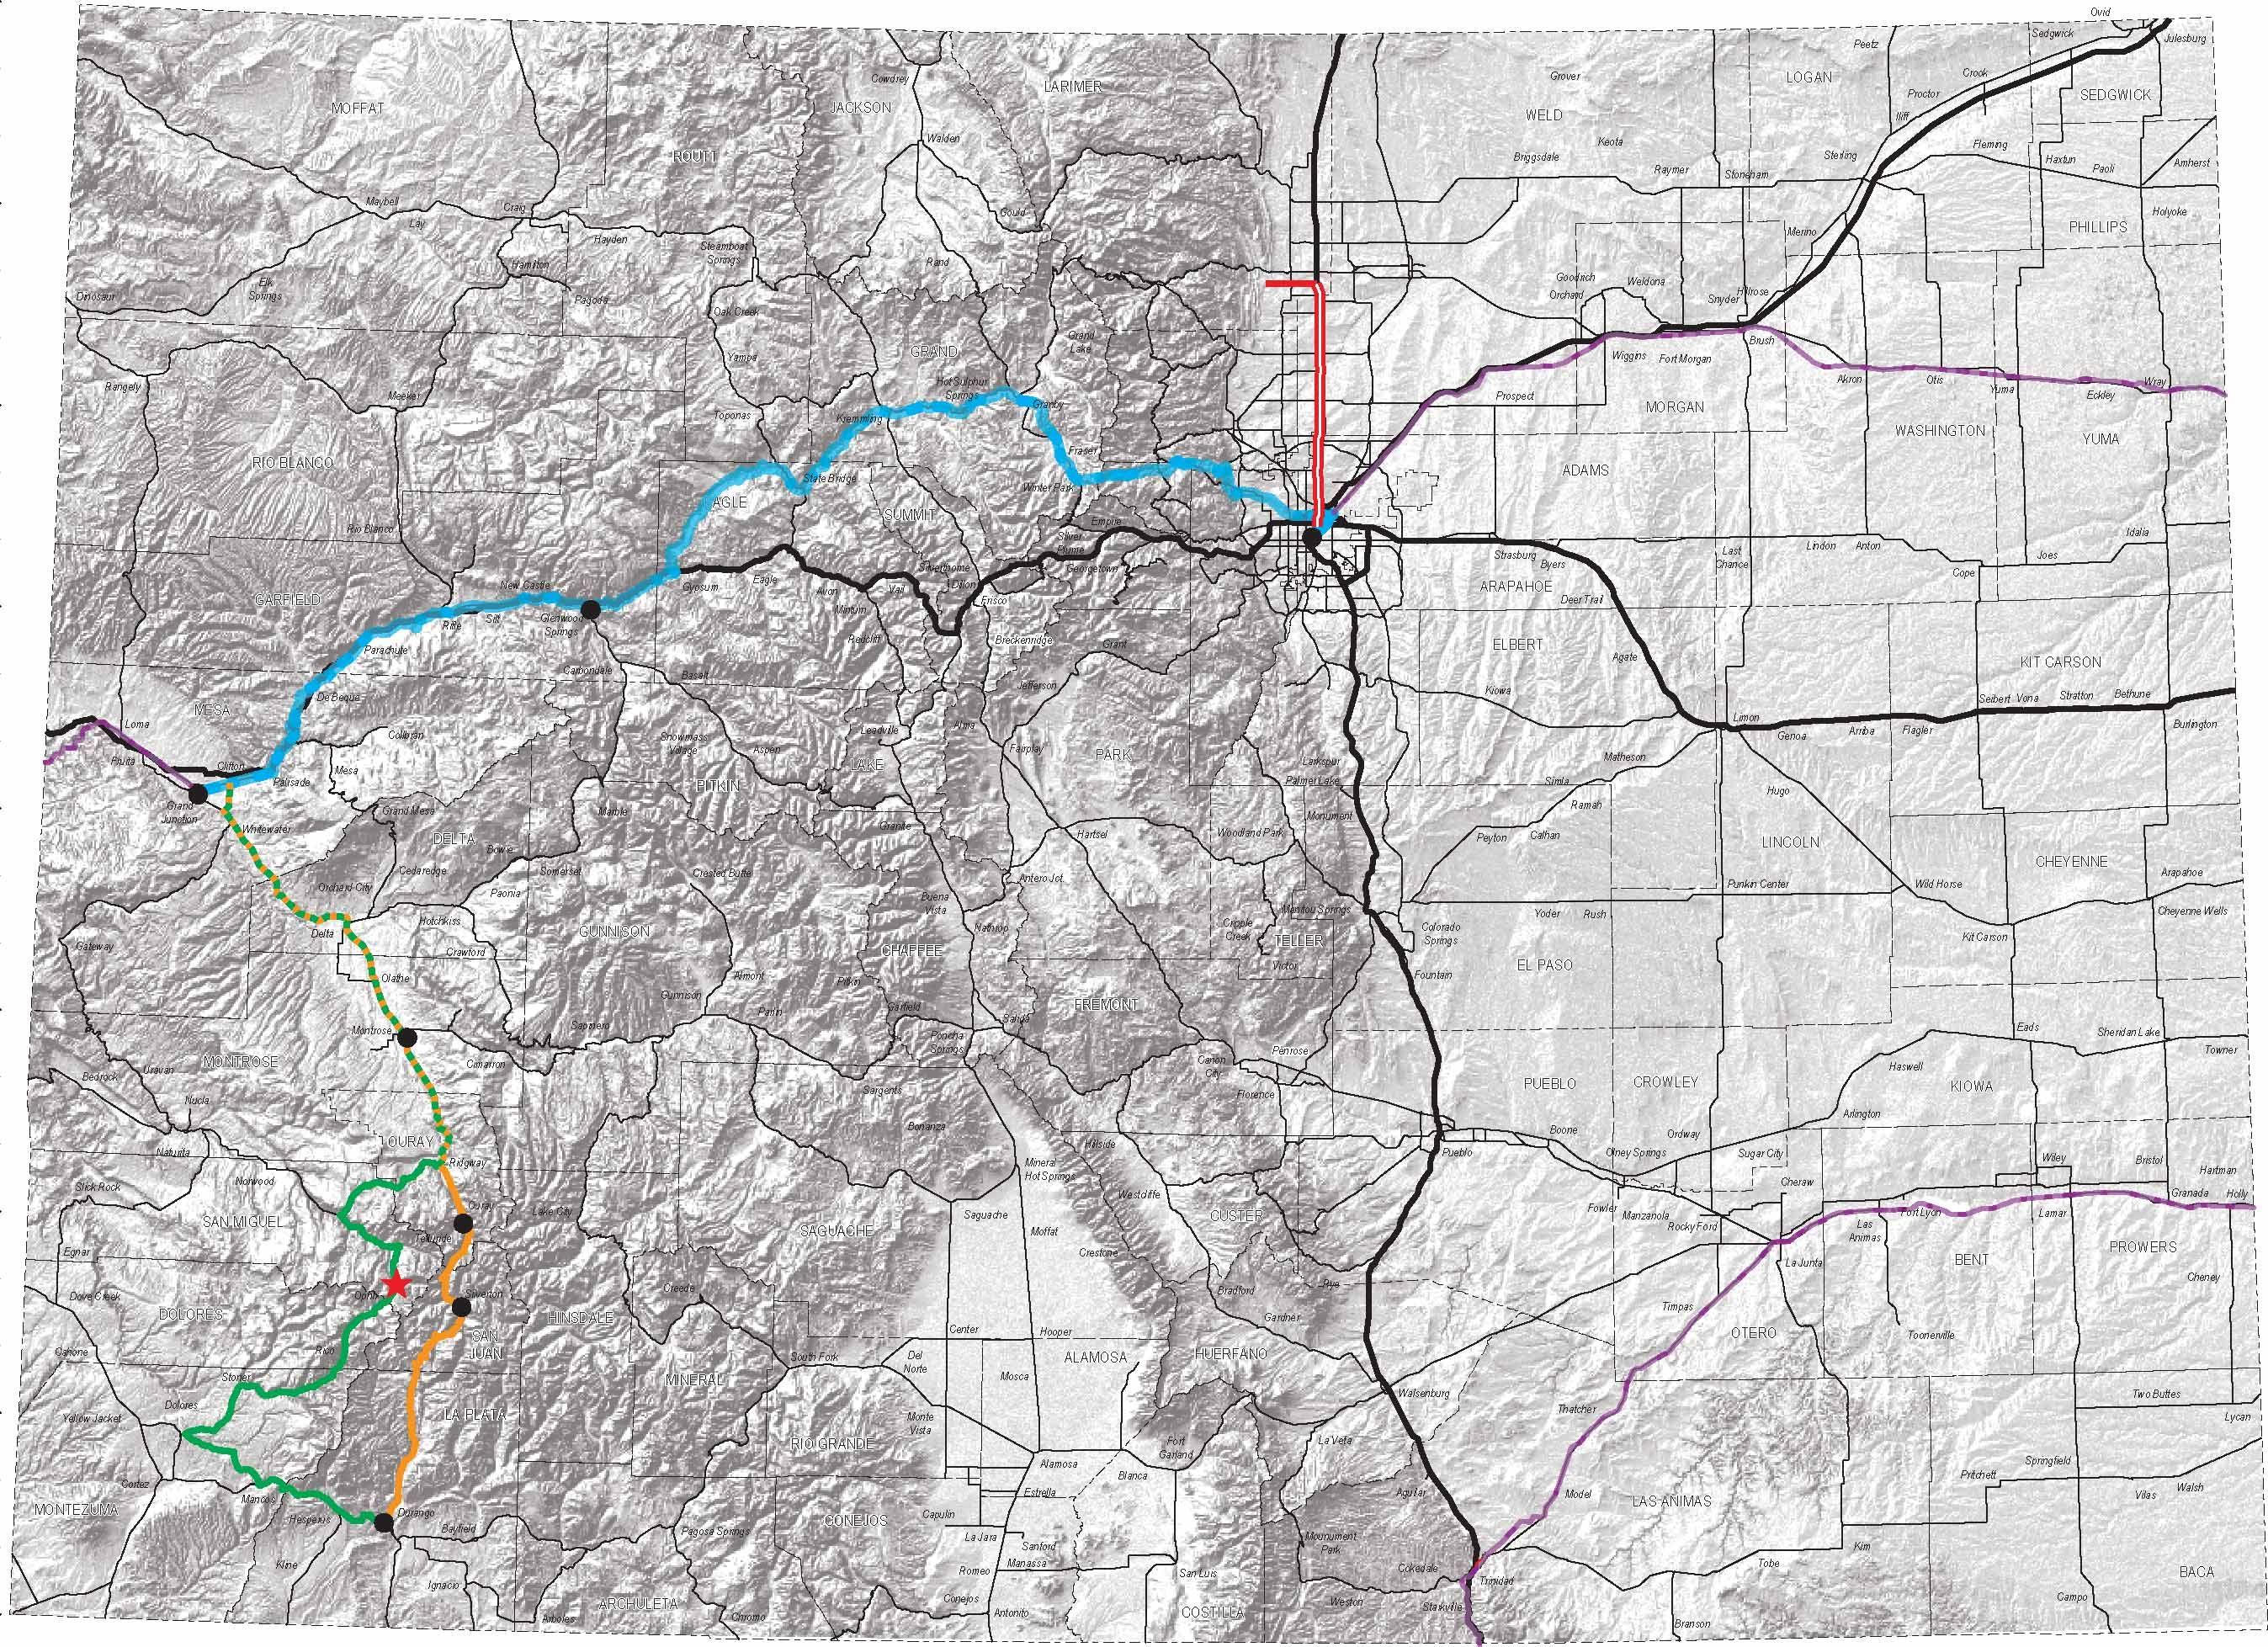 denver colorado elevation map Denver Colorado Topography And Transportation Context Urban Mapping Colorado Denver Colorado denver colorado elevation map